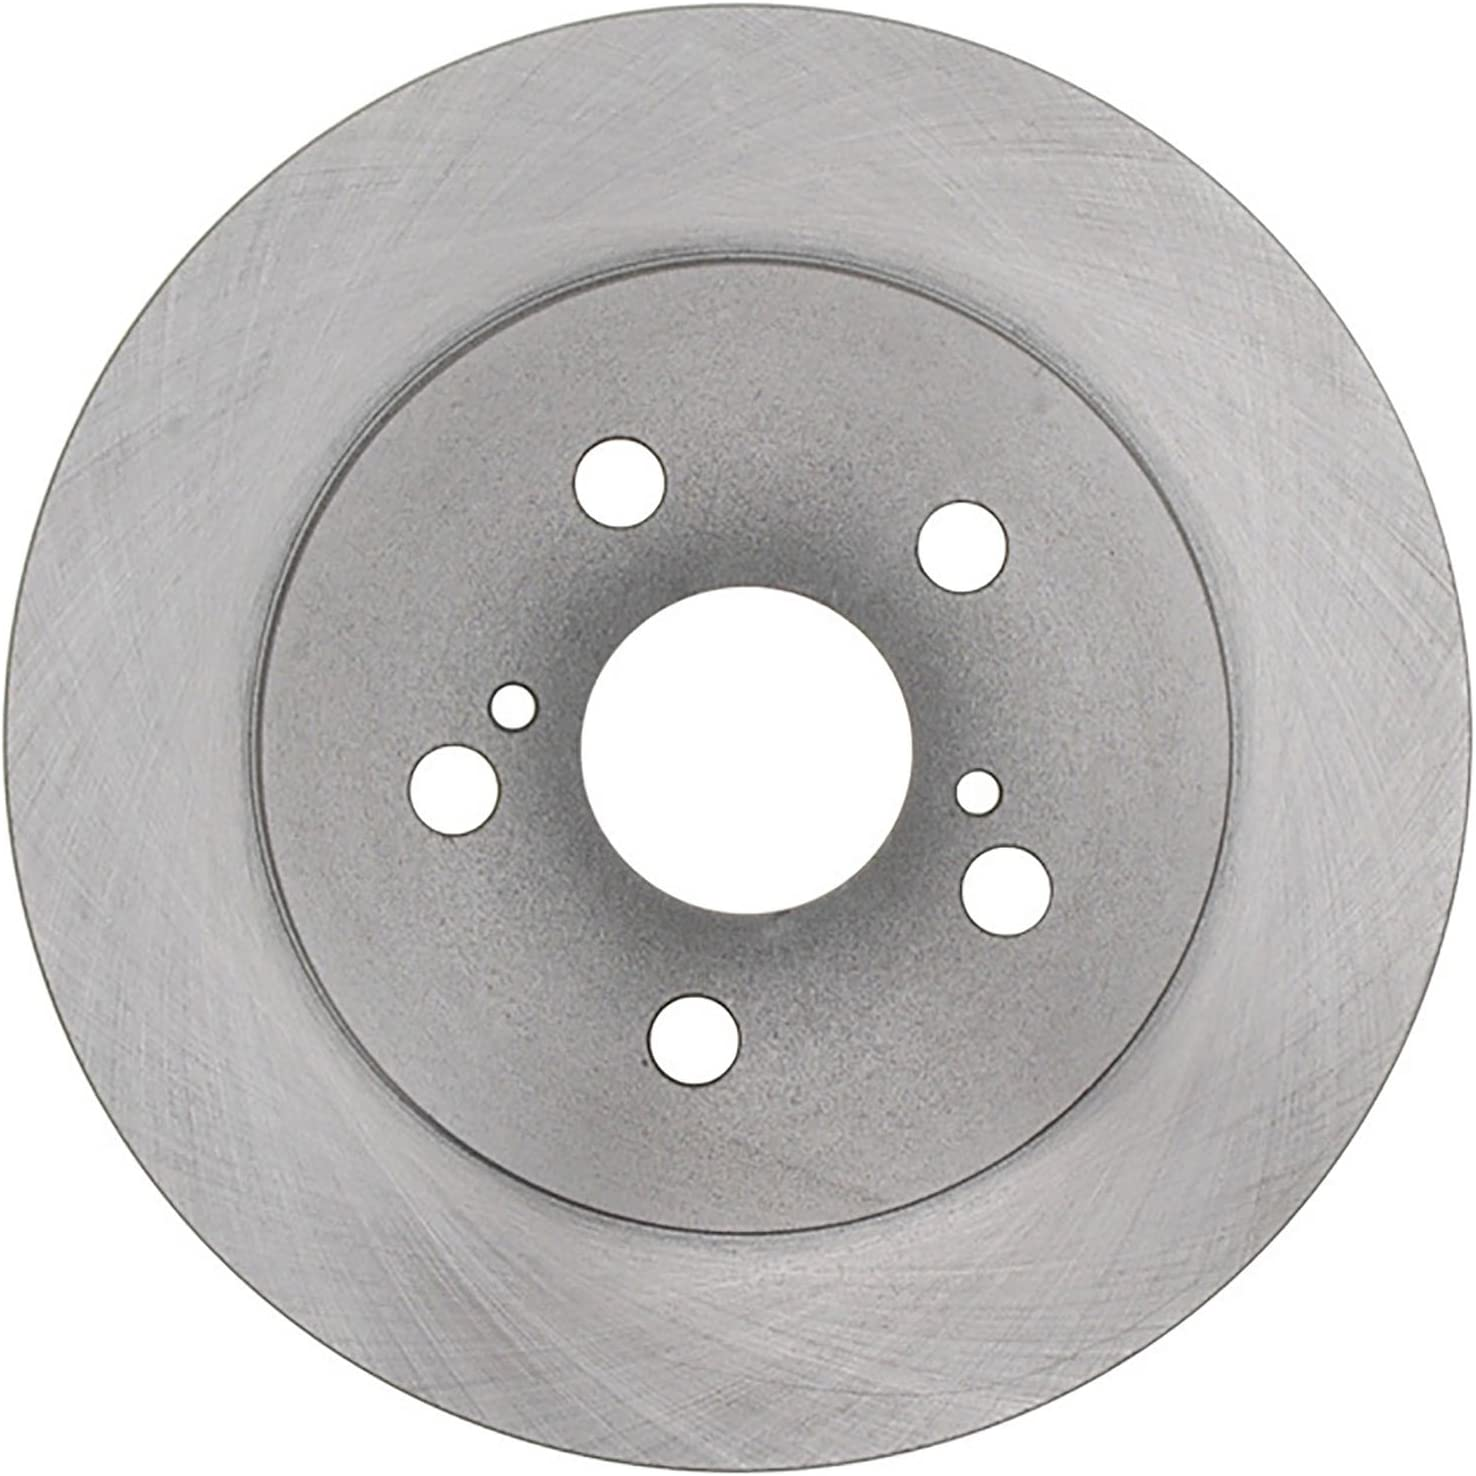 ACDelco 18A2635AC Advantage Coated Rear Disc Brake Rotor